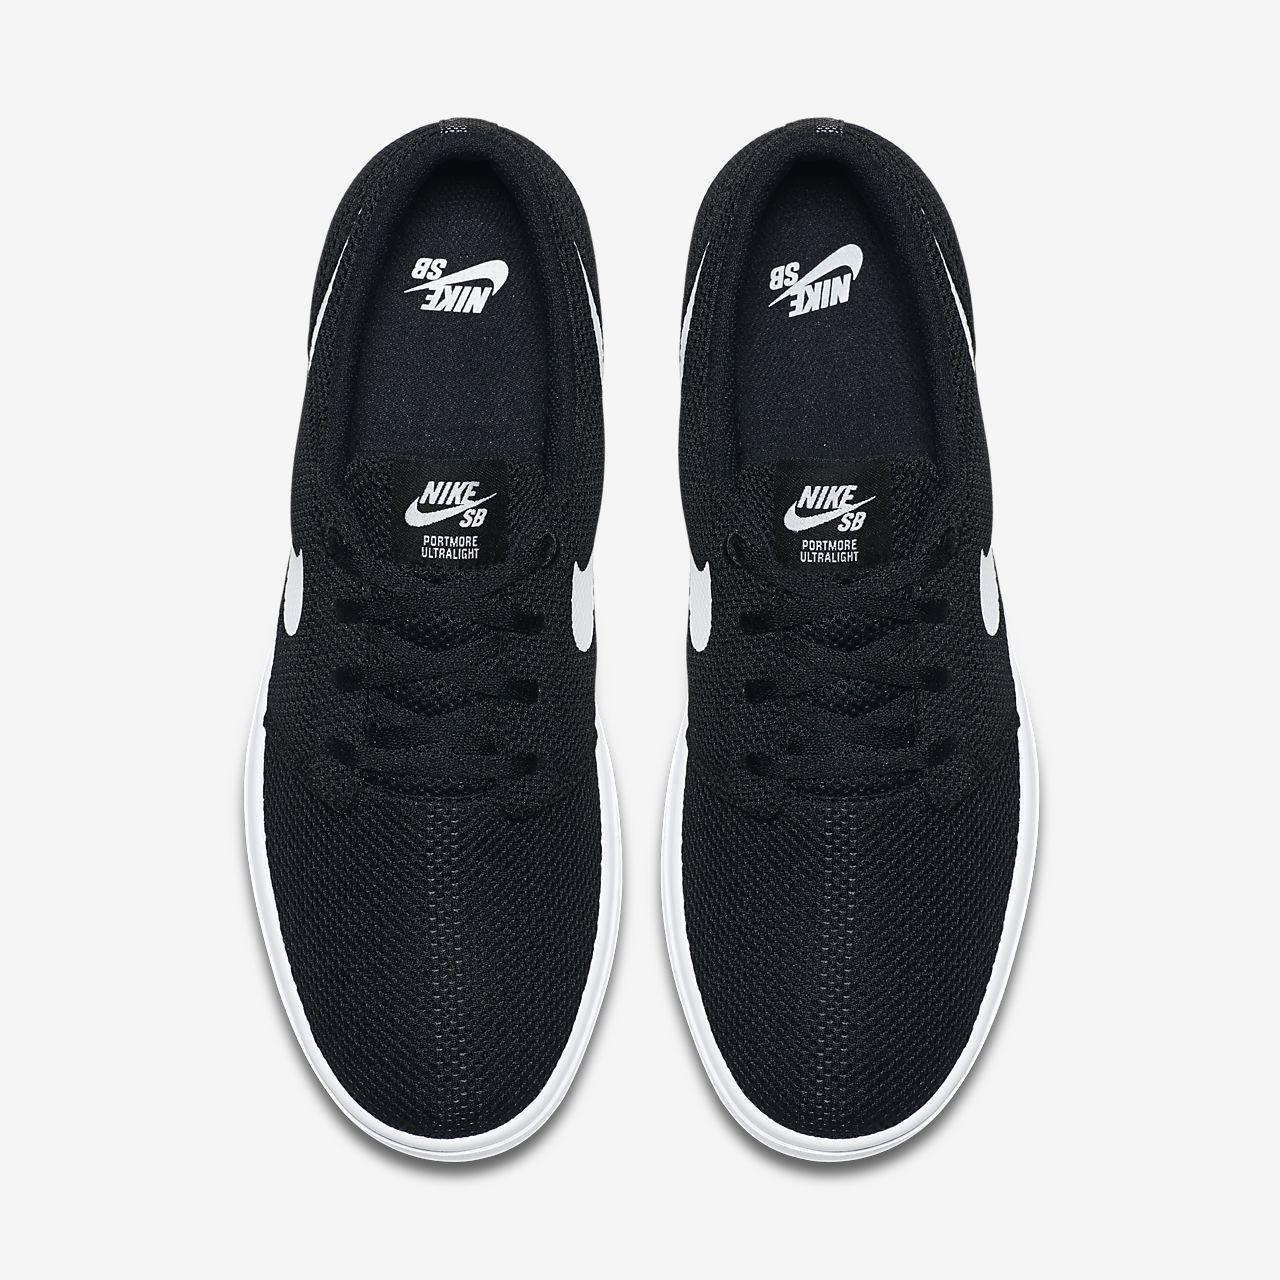 promo code ce9e8 49e4d ... Nike SB Portmore II Ultralight Men s Skateboarding Shoe